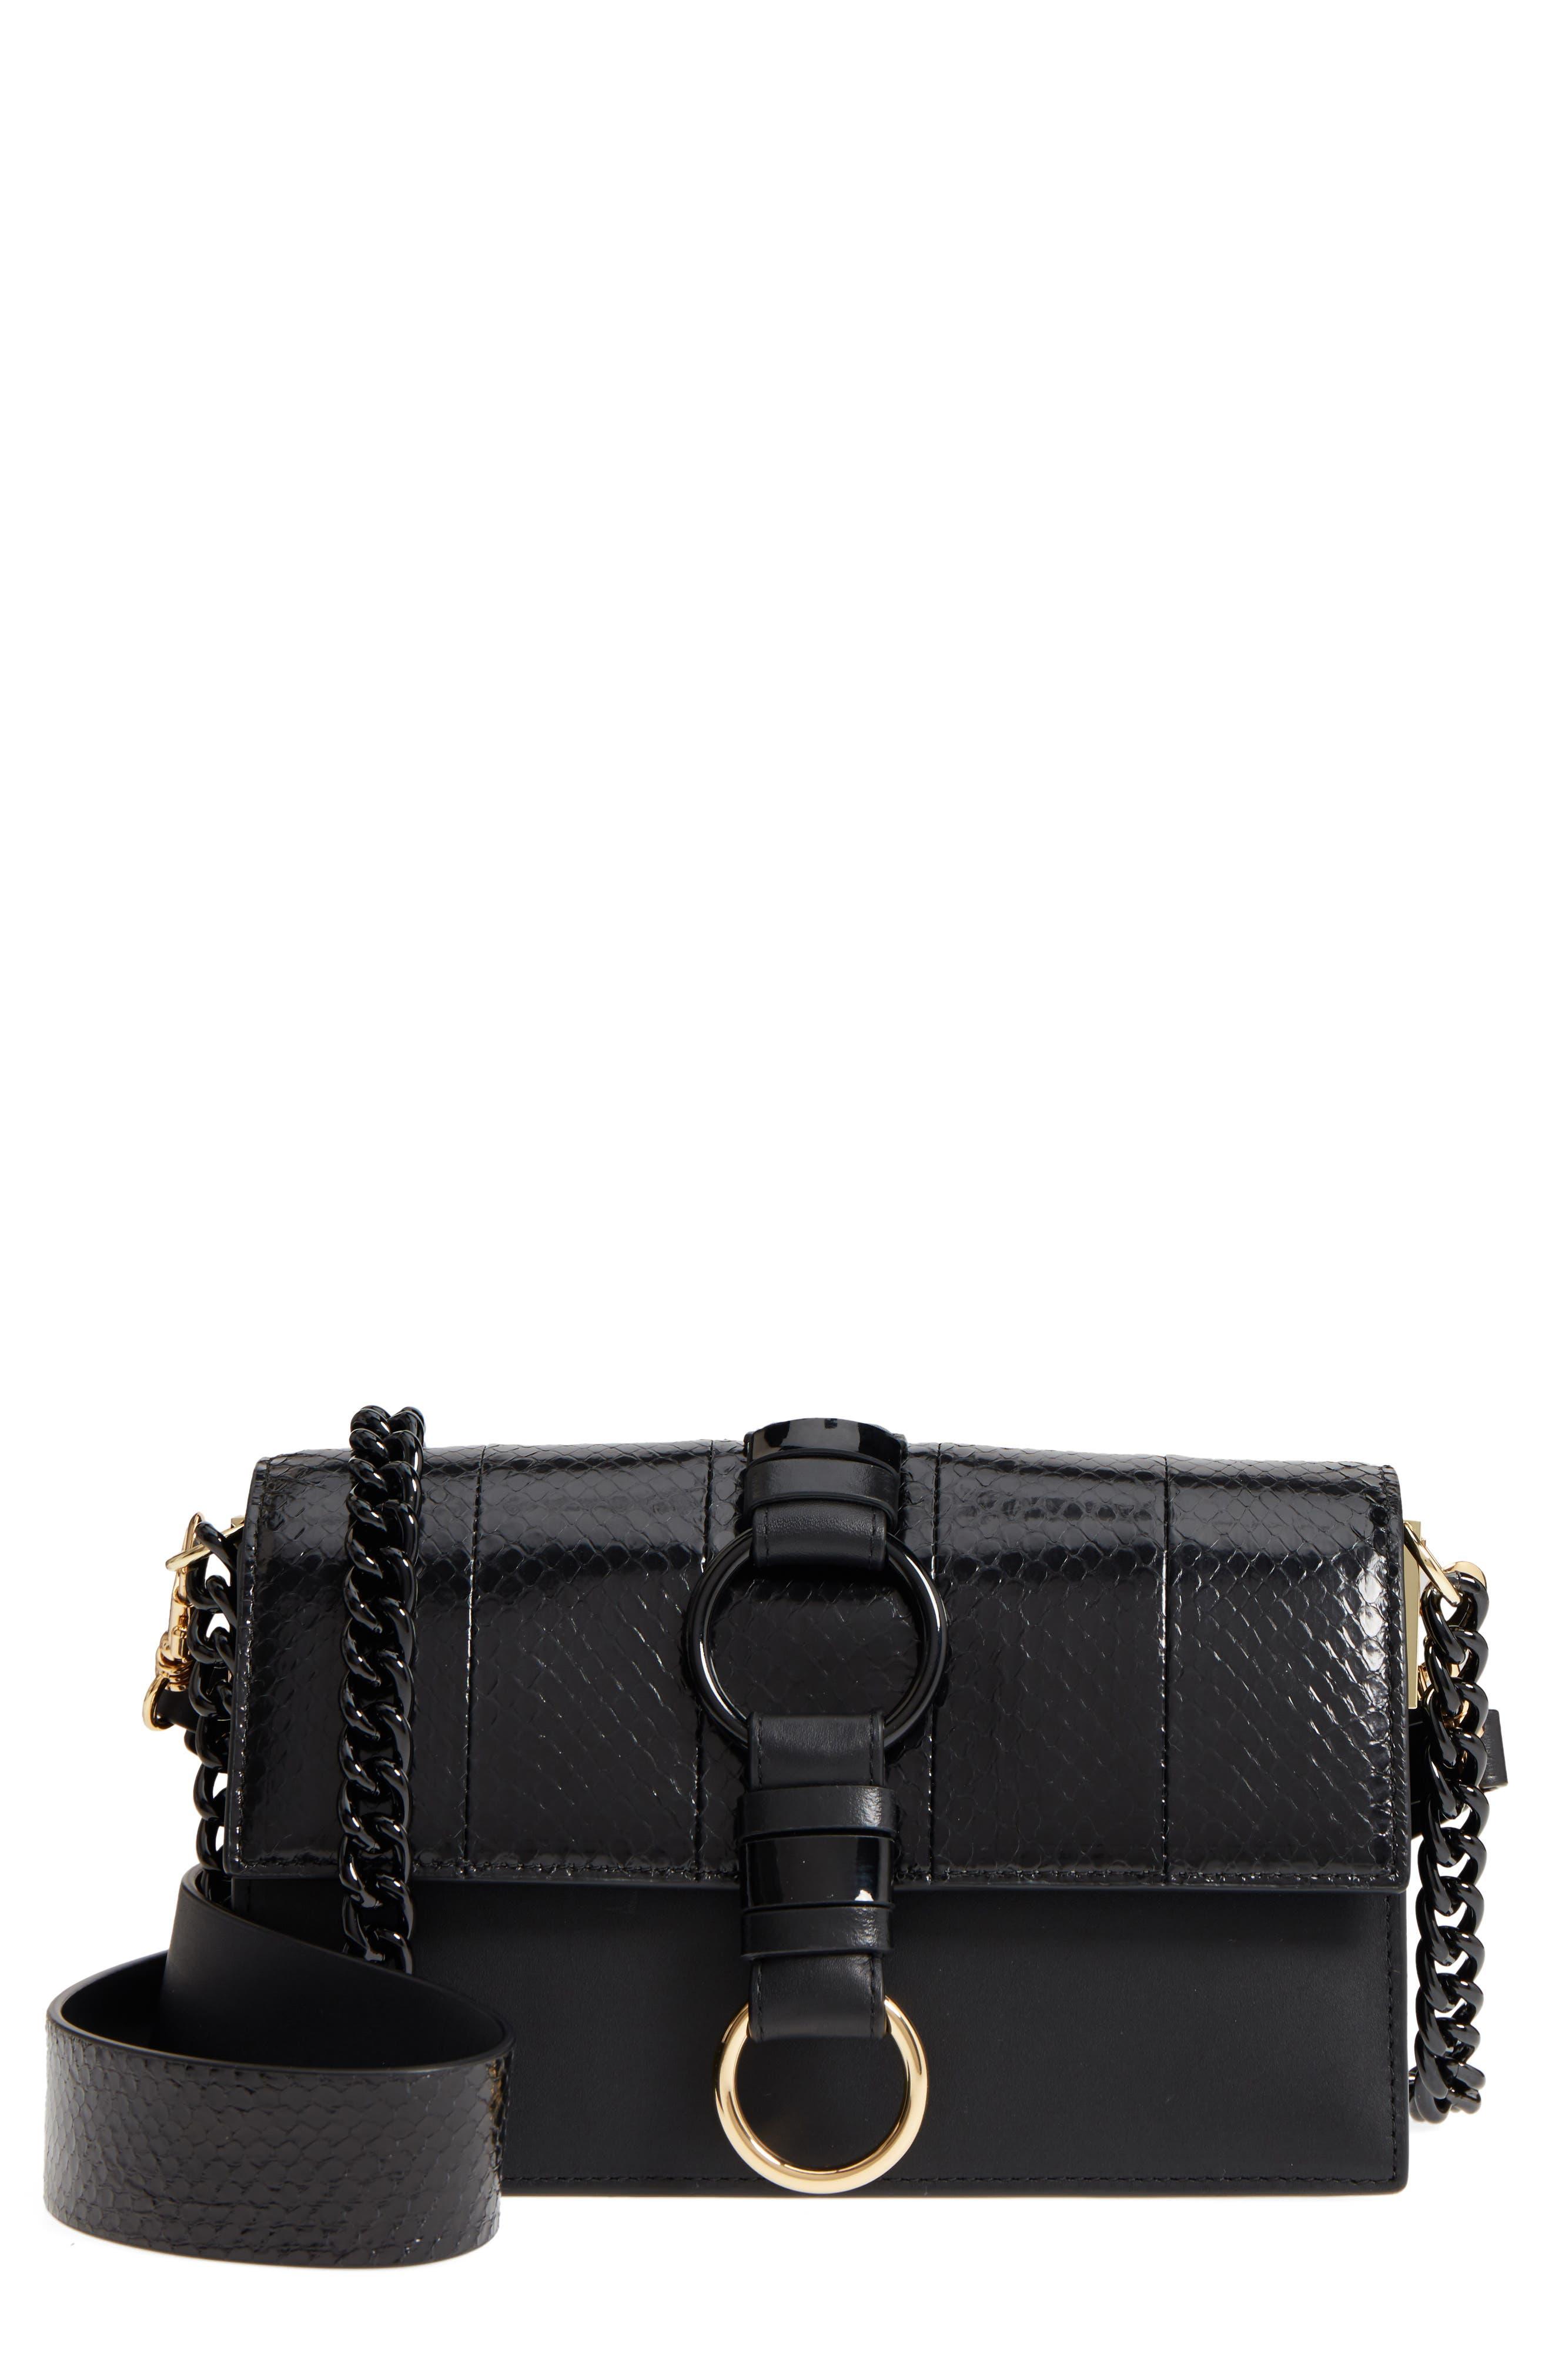 Bonne Journée Leather & Genuine Snakeskin Crossbody Bag,                         Main,                         color, Black